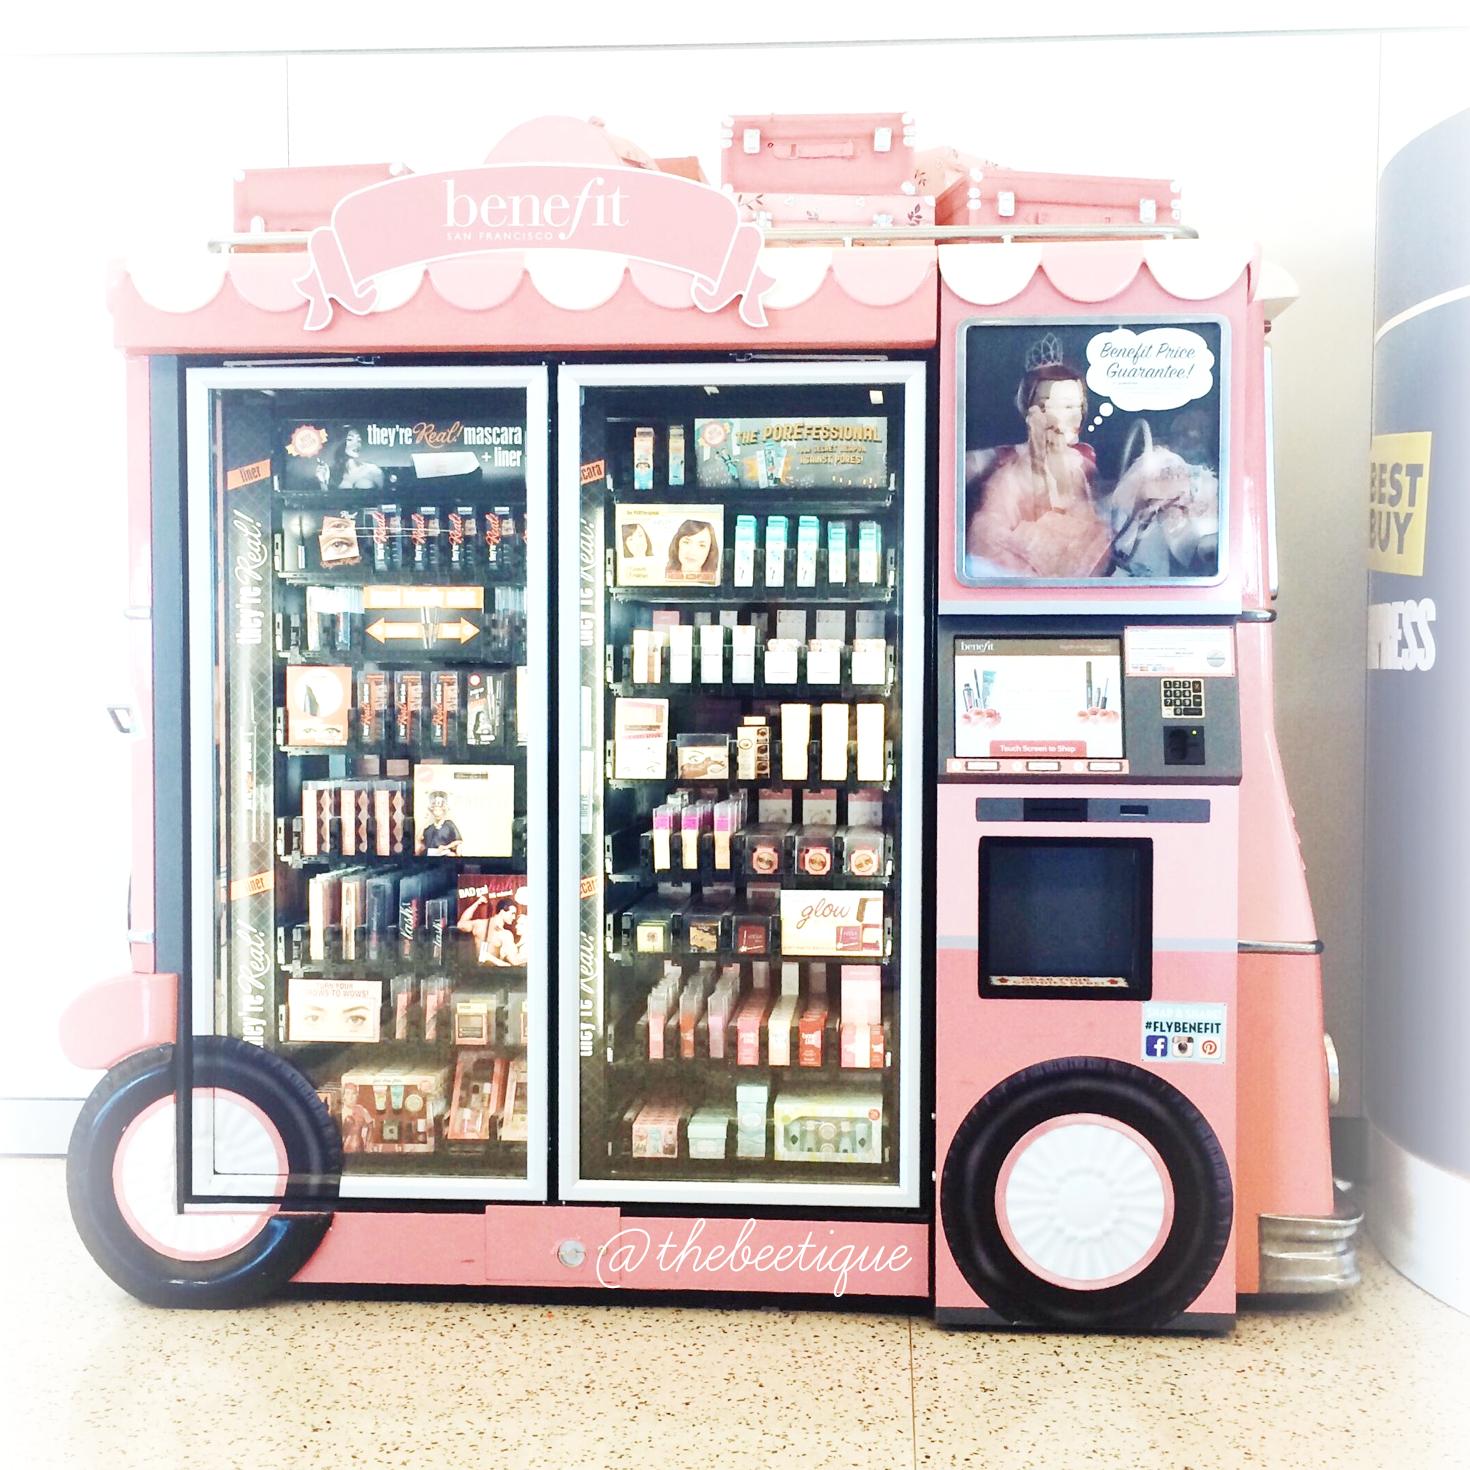 Benefit Cosmetics Vending Machine Benefit cosmetics